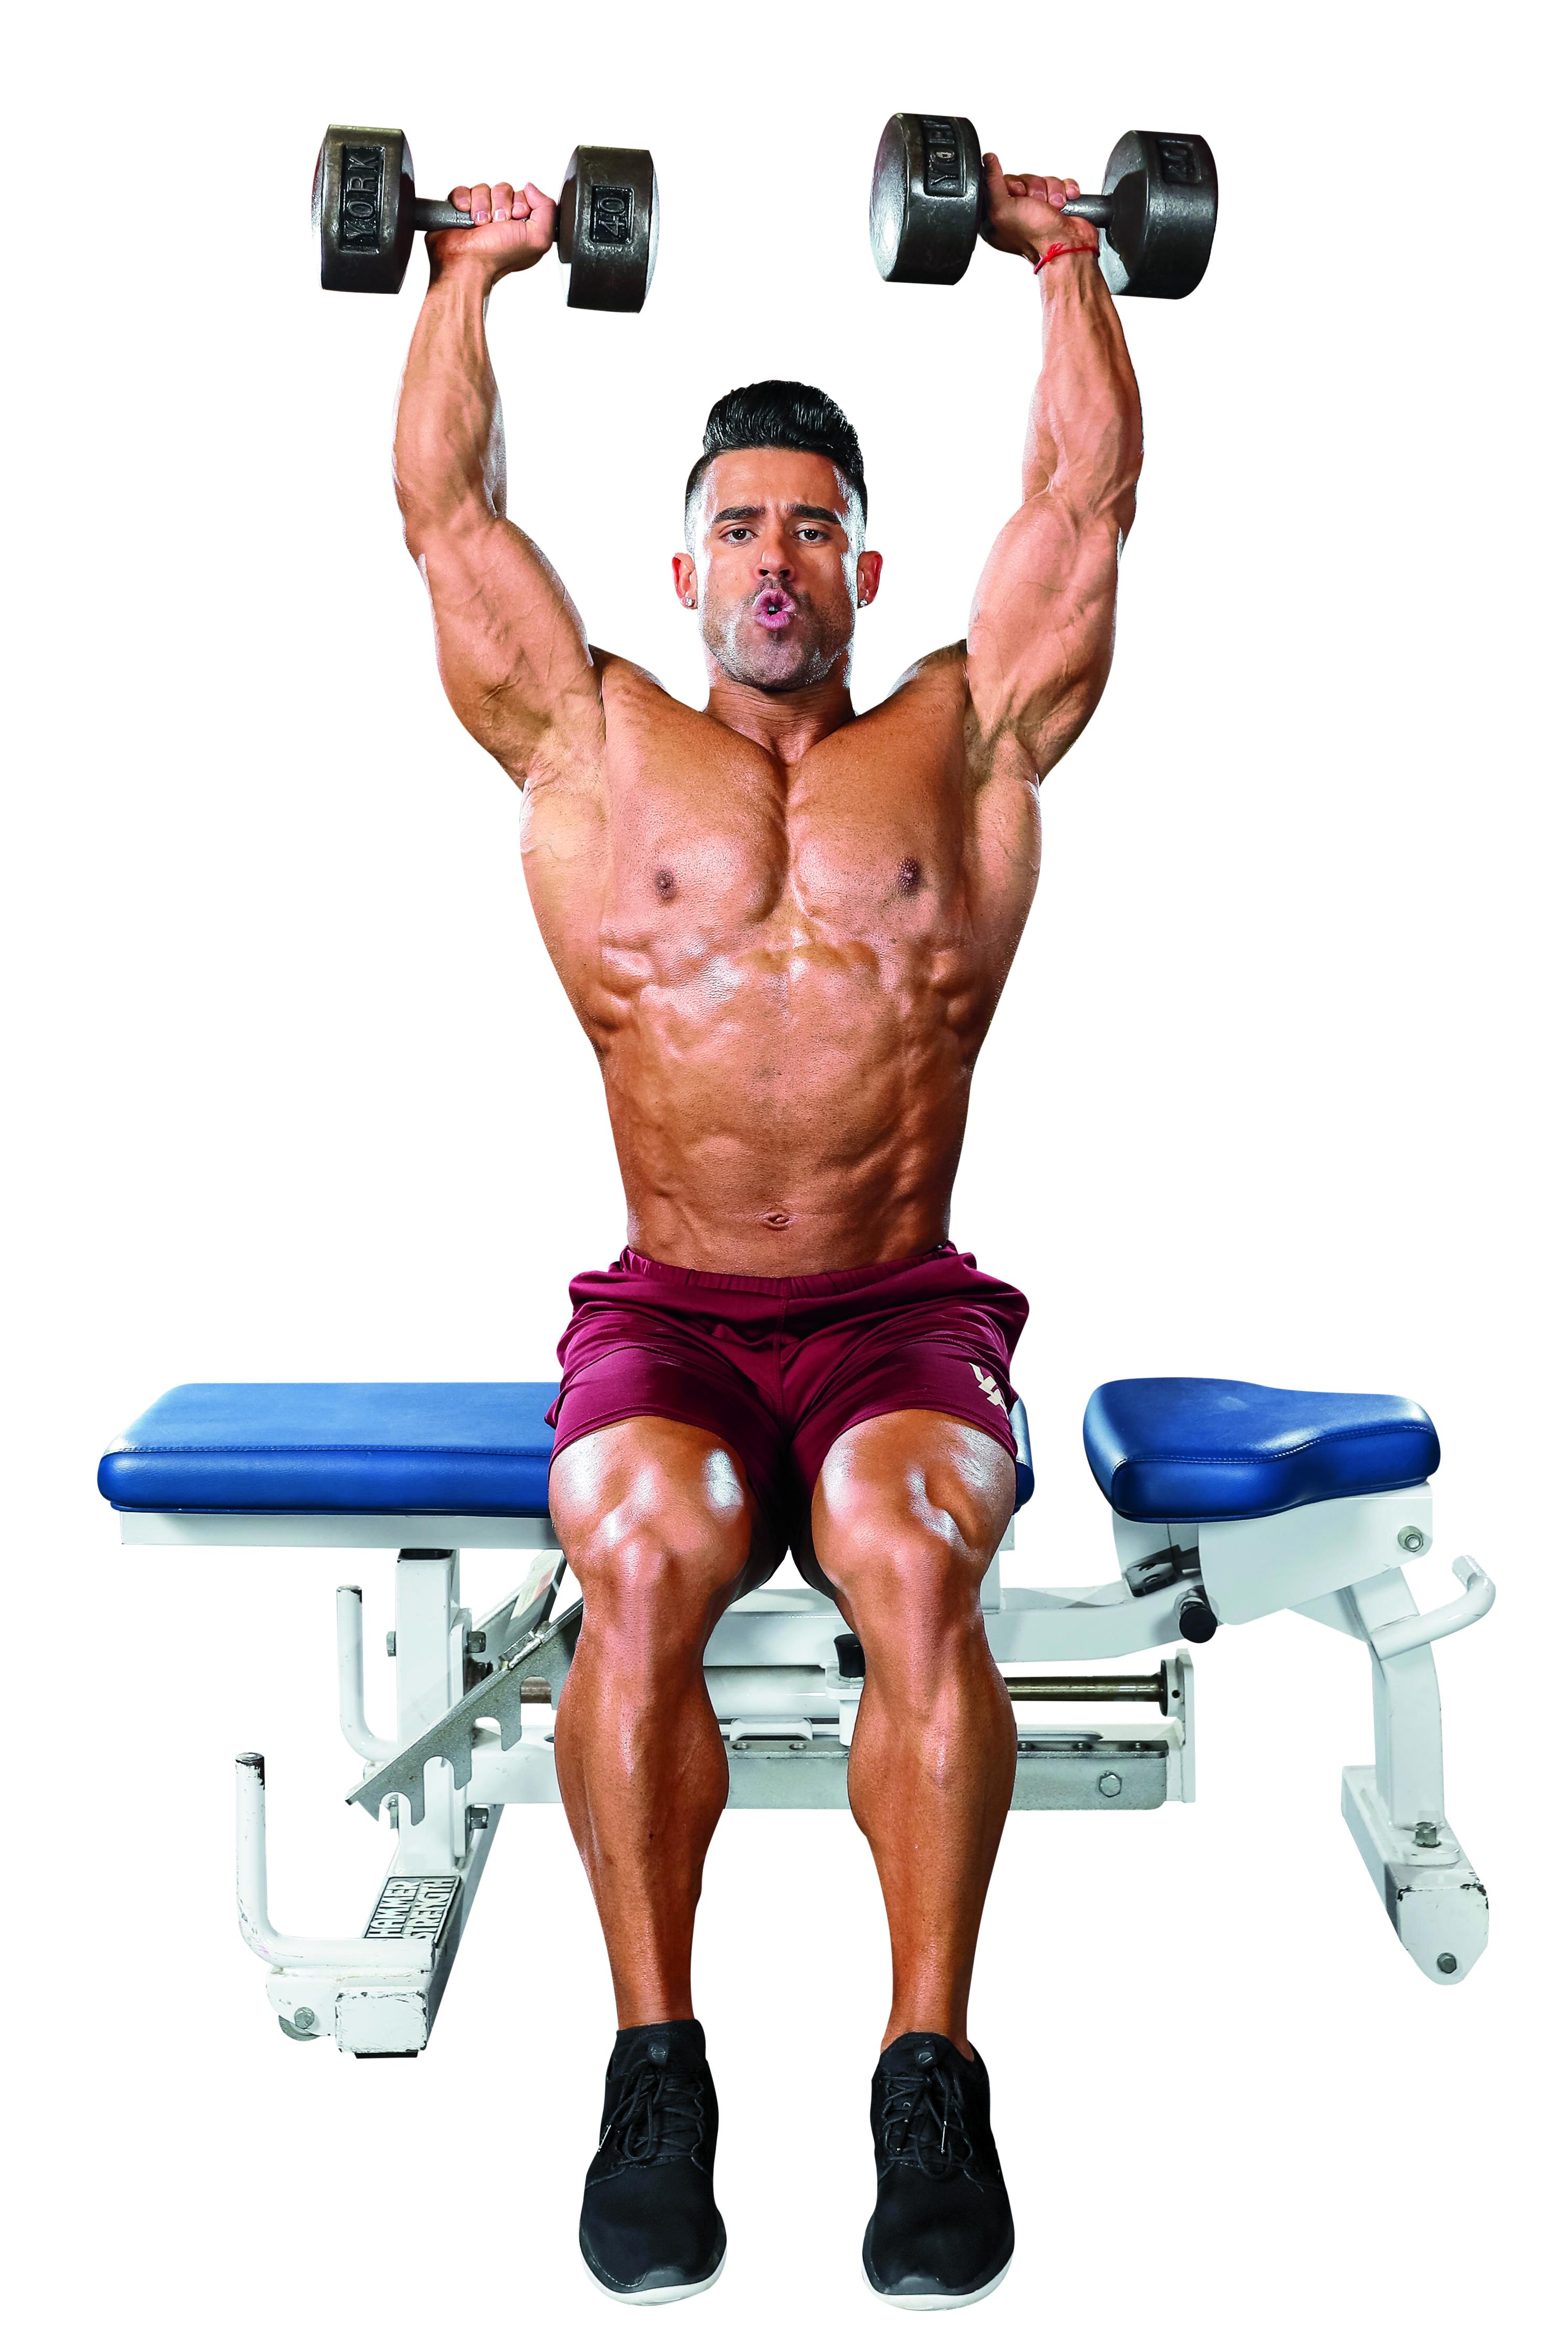 foto arnoldovy tlaky na ramena